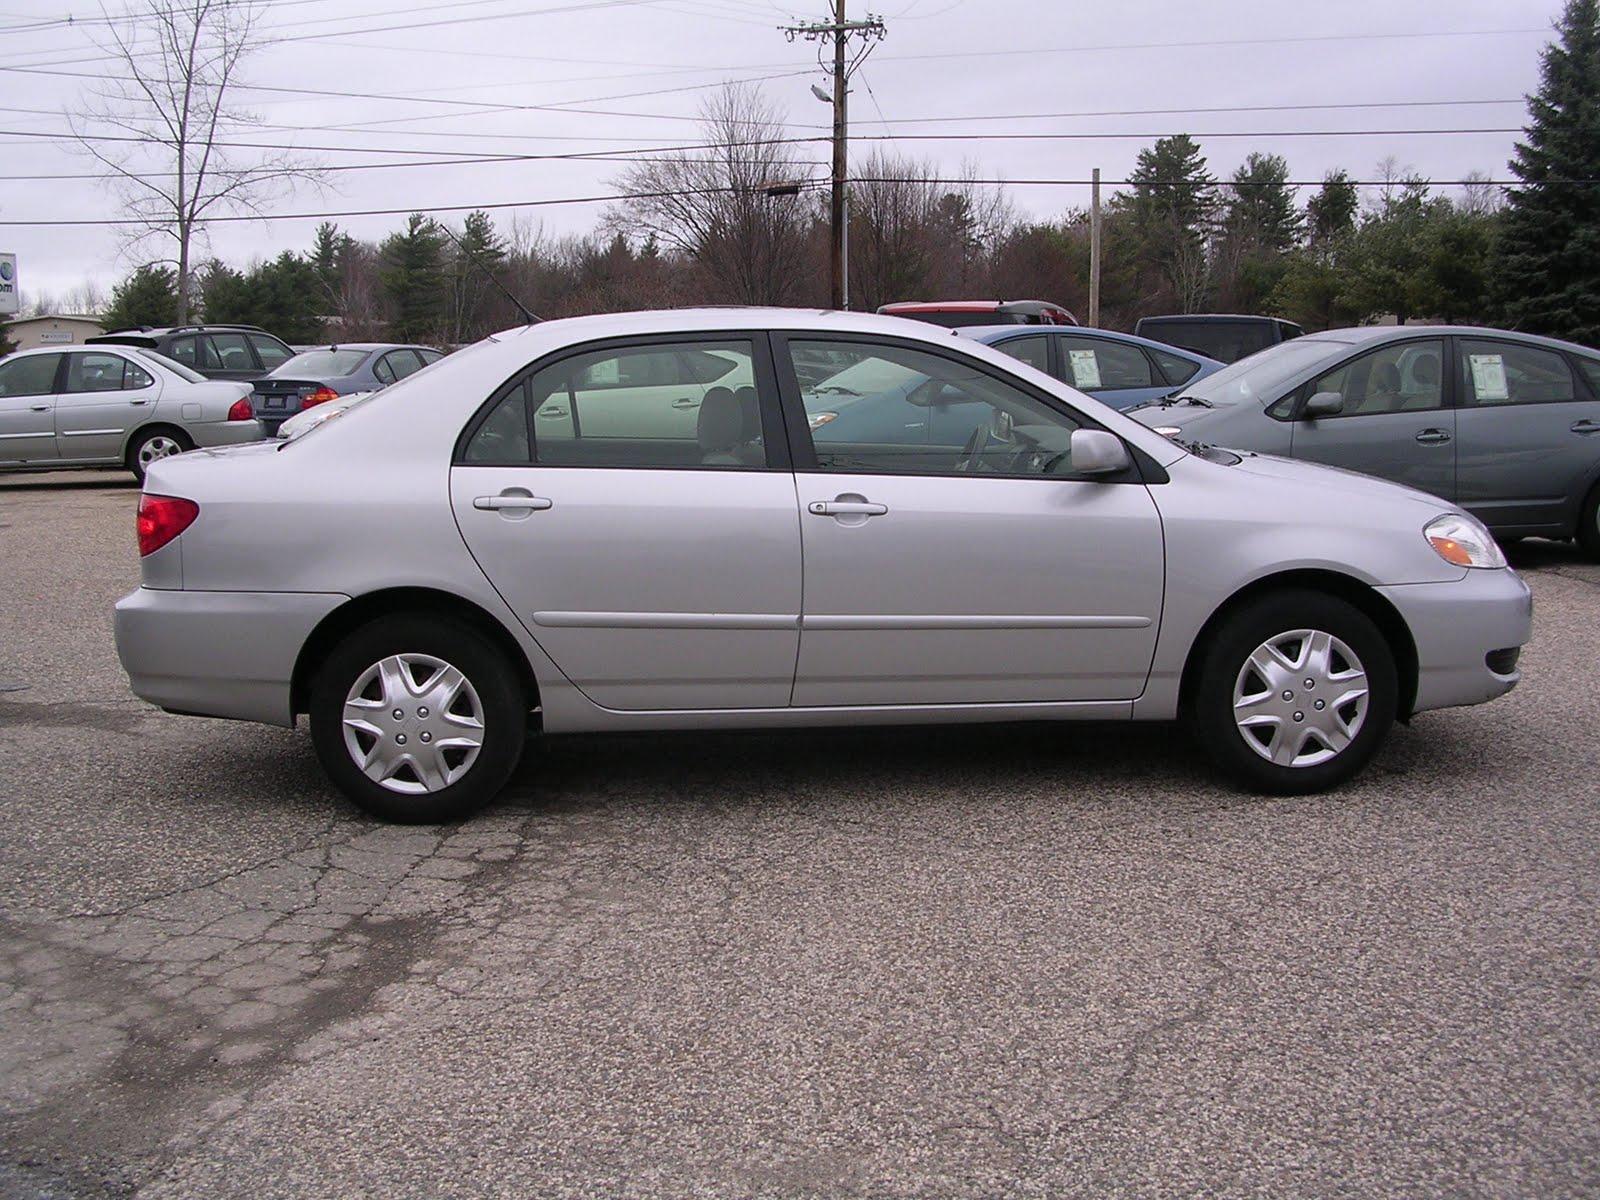 2006 Toyota Corolla LE, Sedan, Gold, 57728 Mi, $11,900 Http://bit.ly/lTfD8S  Compact, 4 Spd Automatic, MPG U003d 26/35